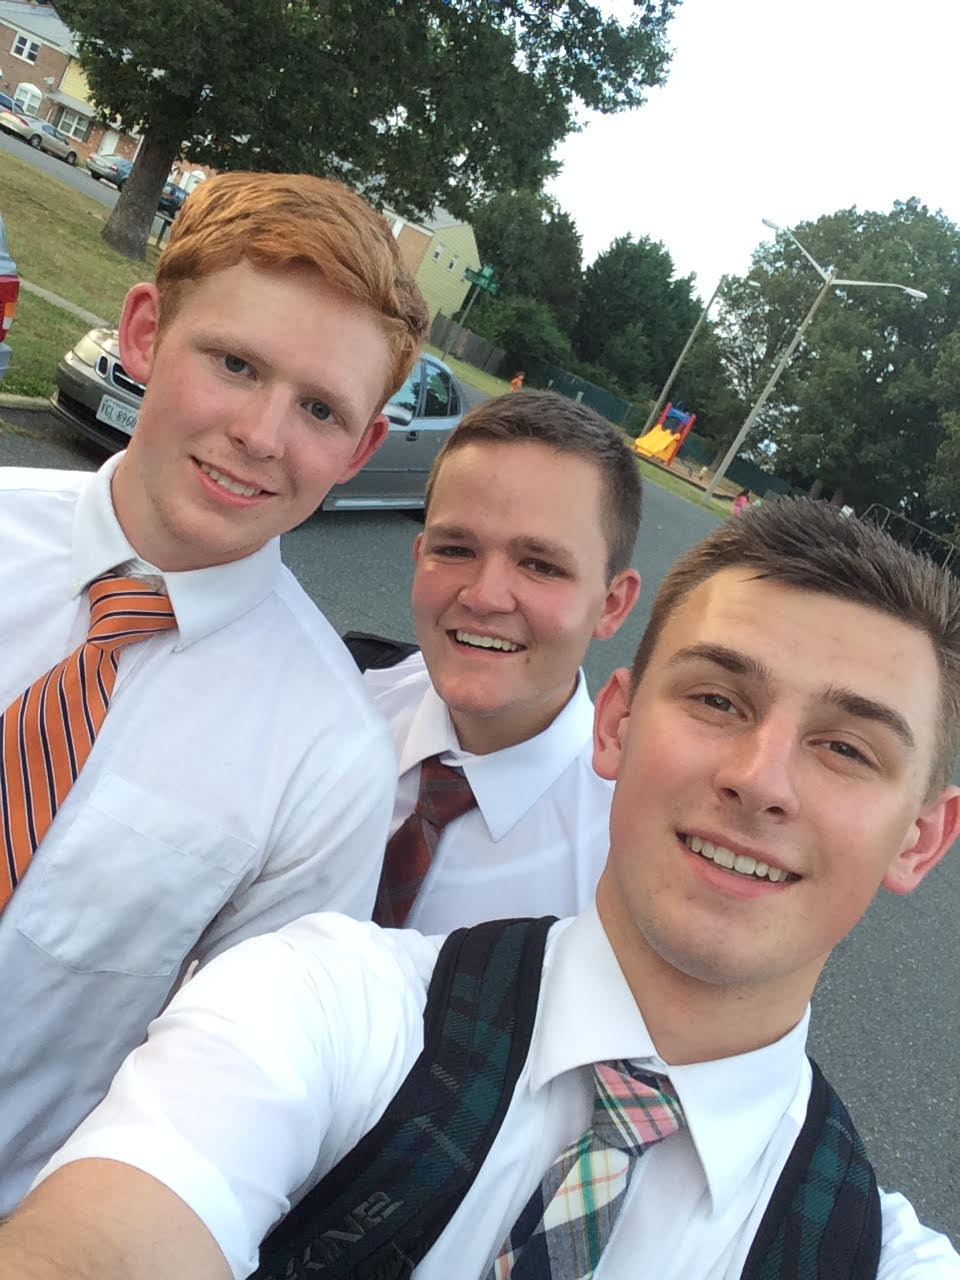 Left to Right: Colin, Elder Maedgen, Elder Larson